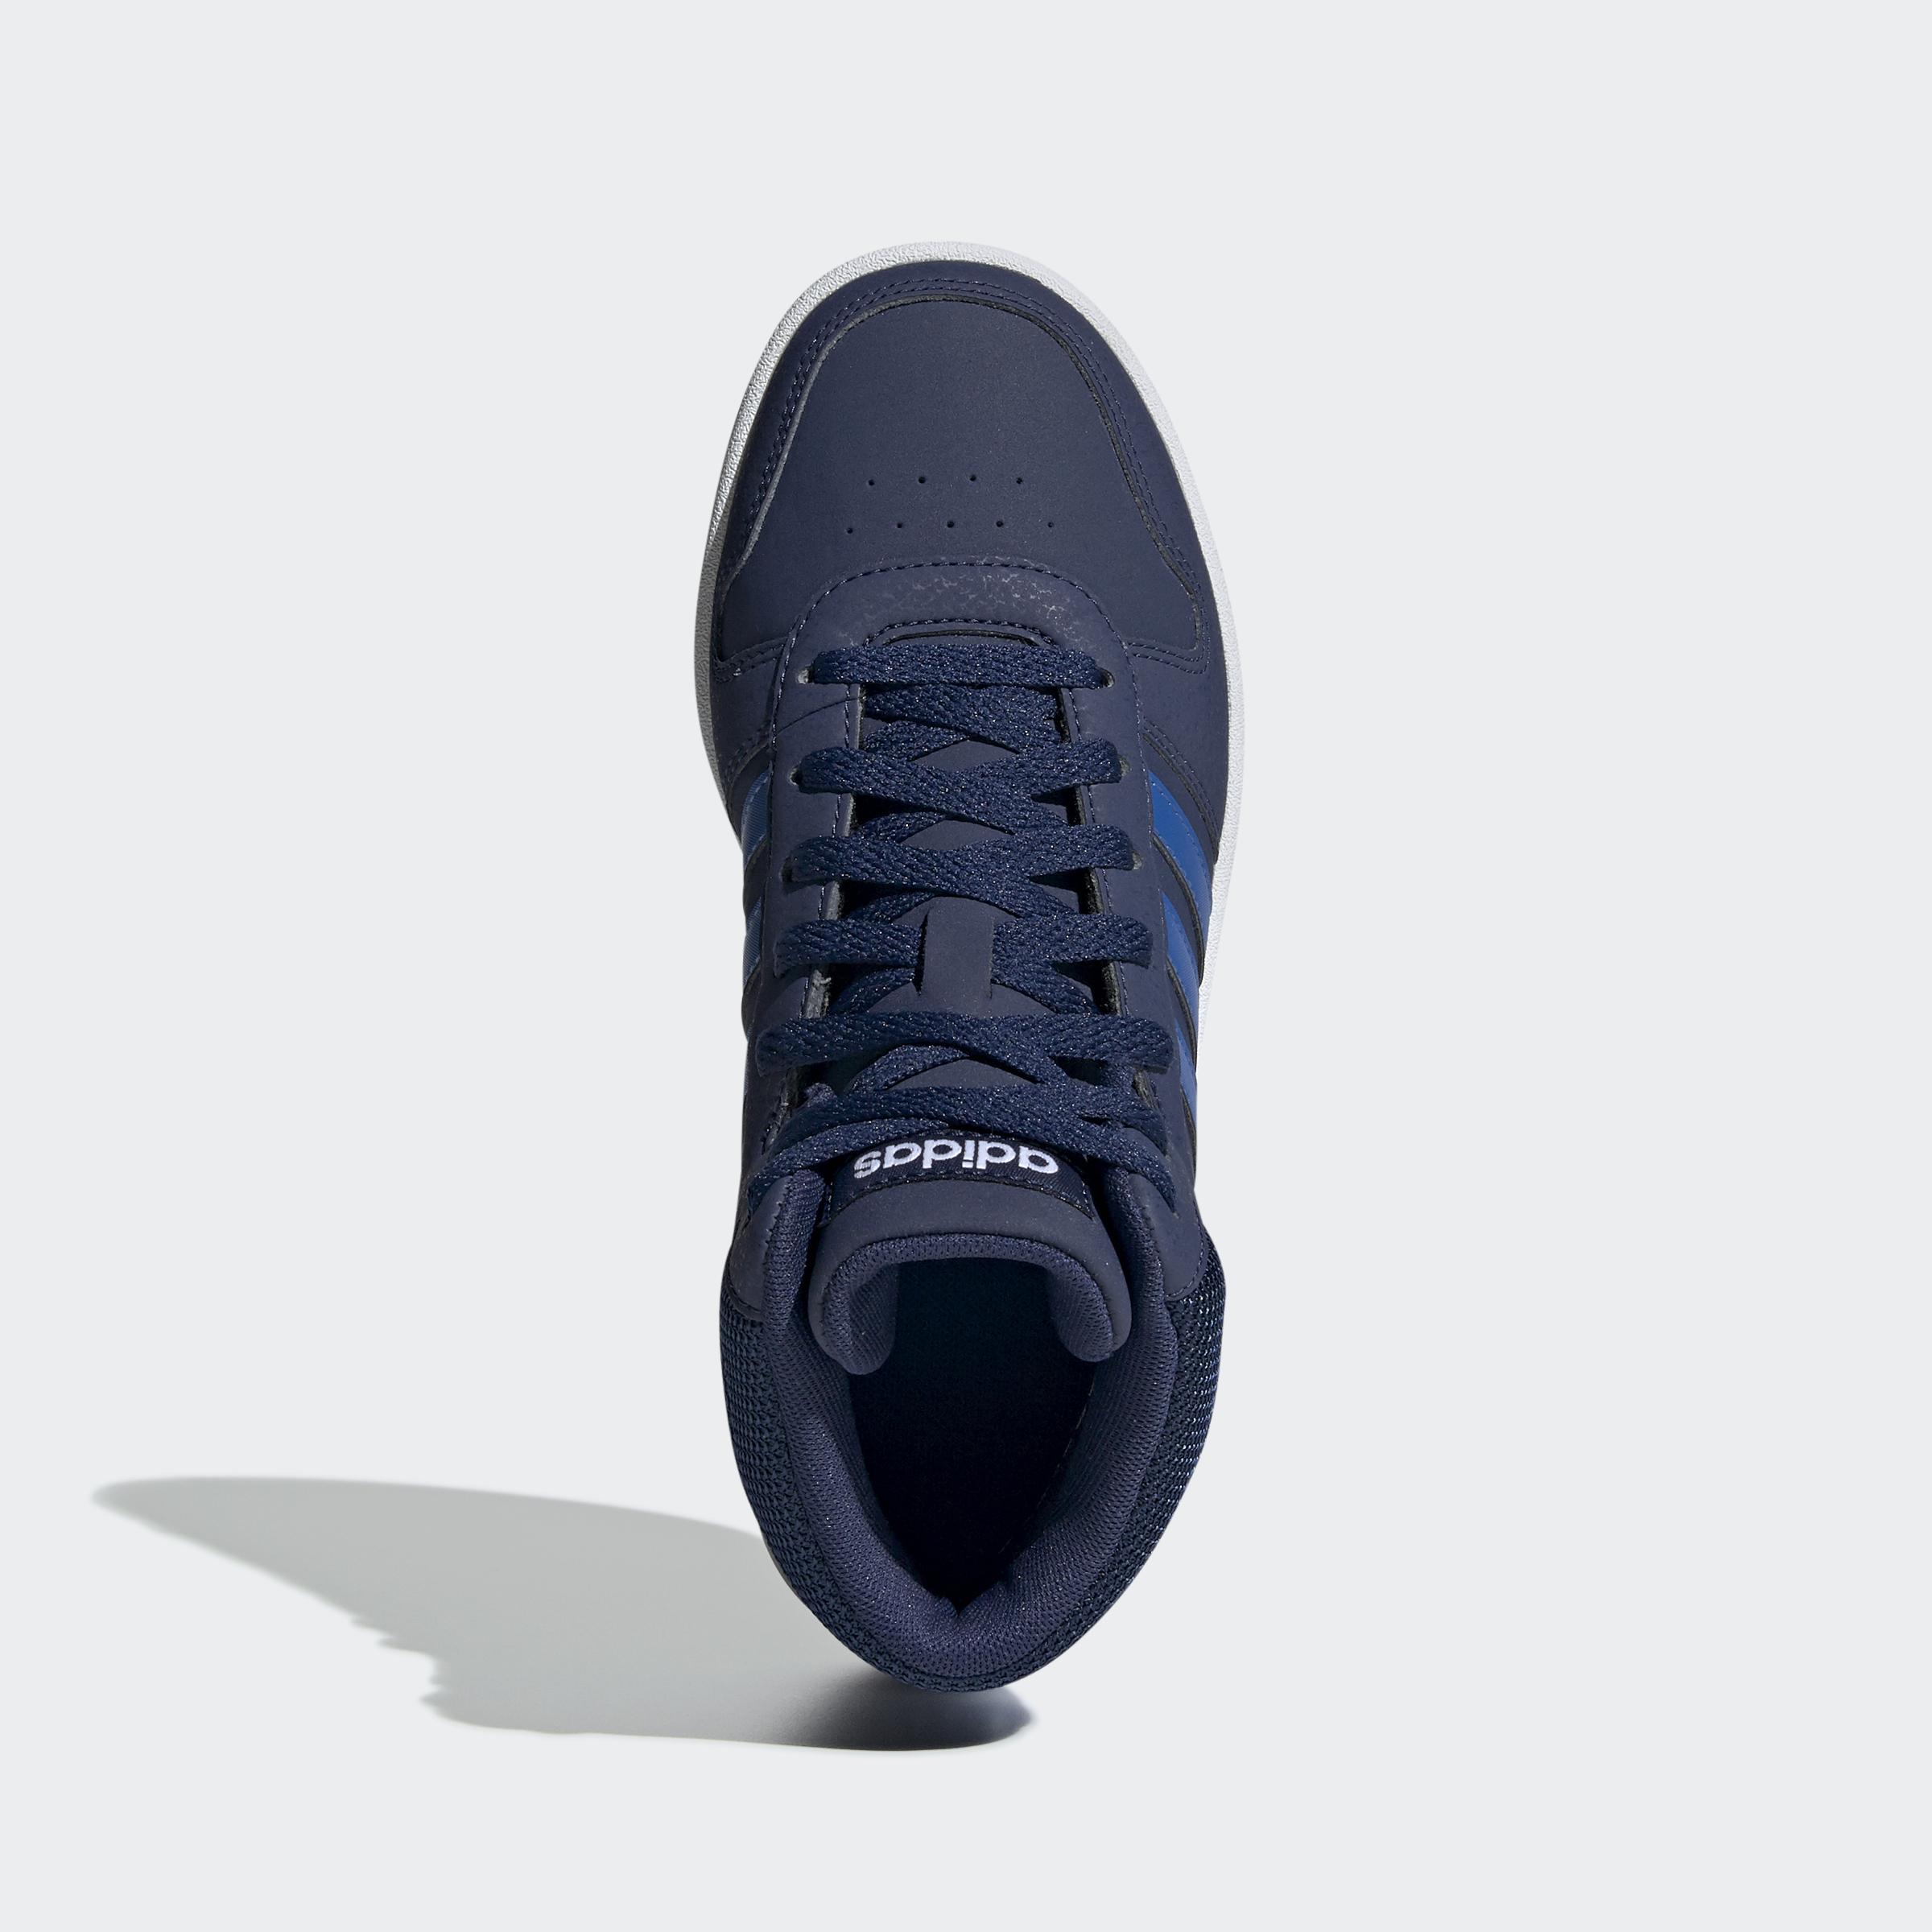 adidas-Hoops-2-0-Mid-Shoes-Kids-039-High-Tops thumbnail 12